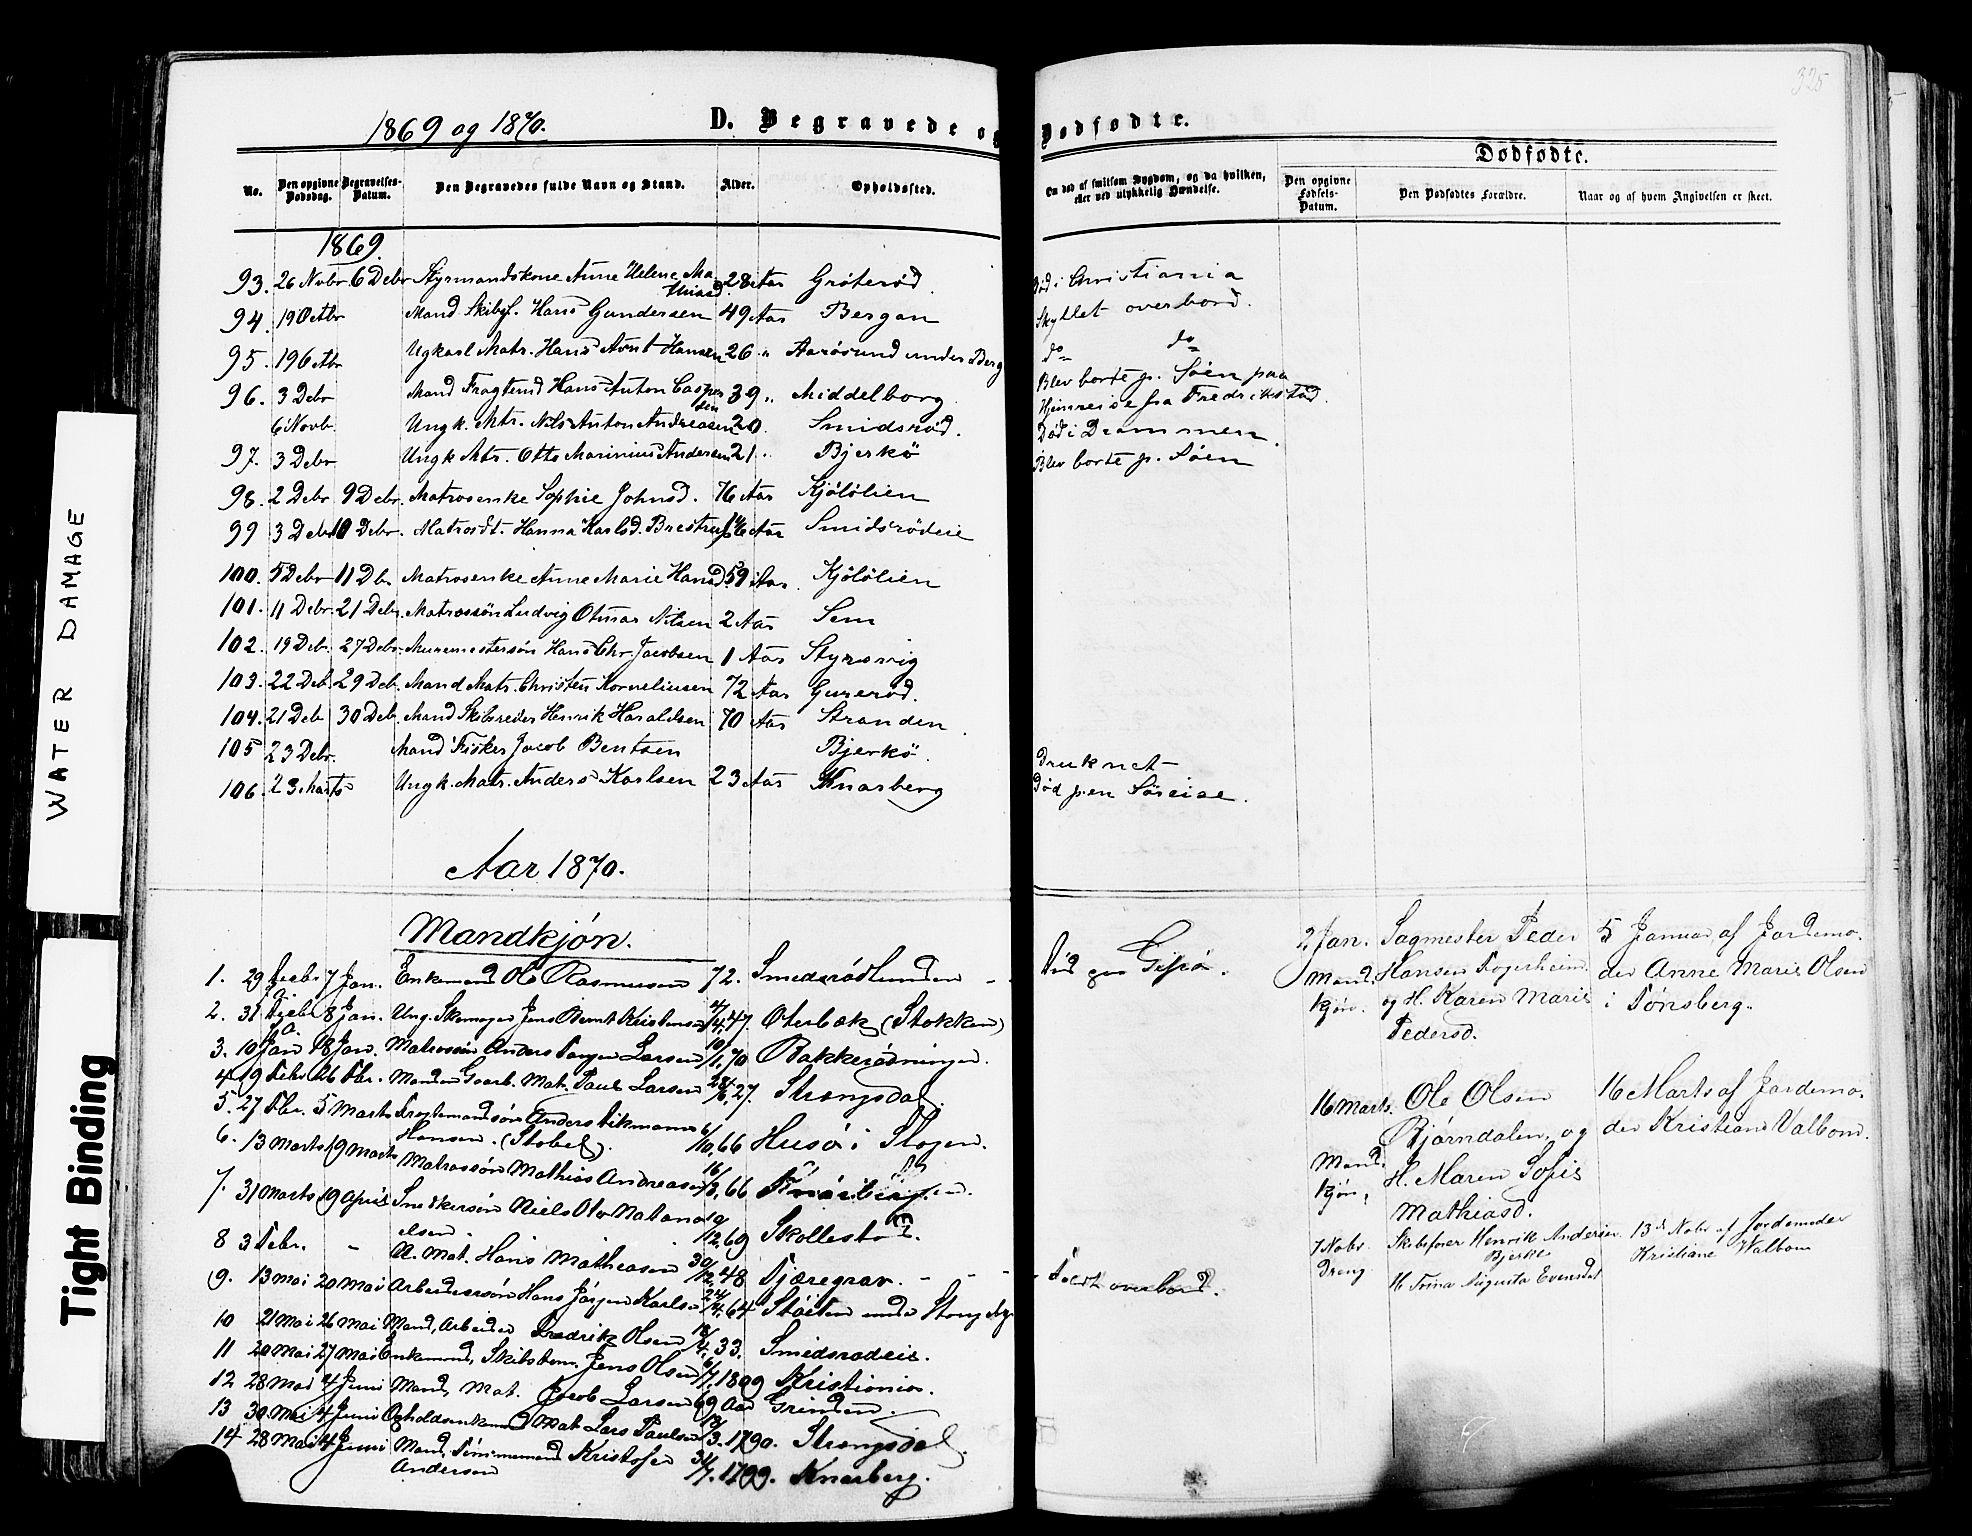 SAKO, Nøtterøy kirkebøker, F/Fa/L0007: Ministerialbok nr. I 7, 1865-1877, s. 325